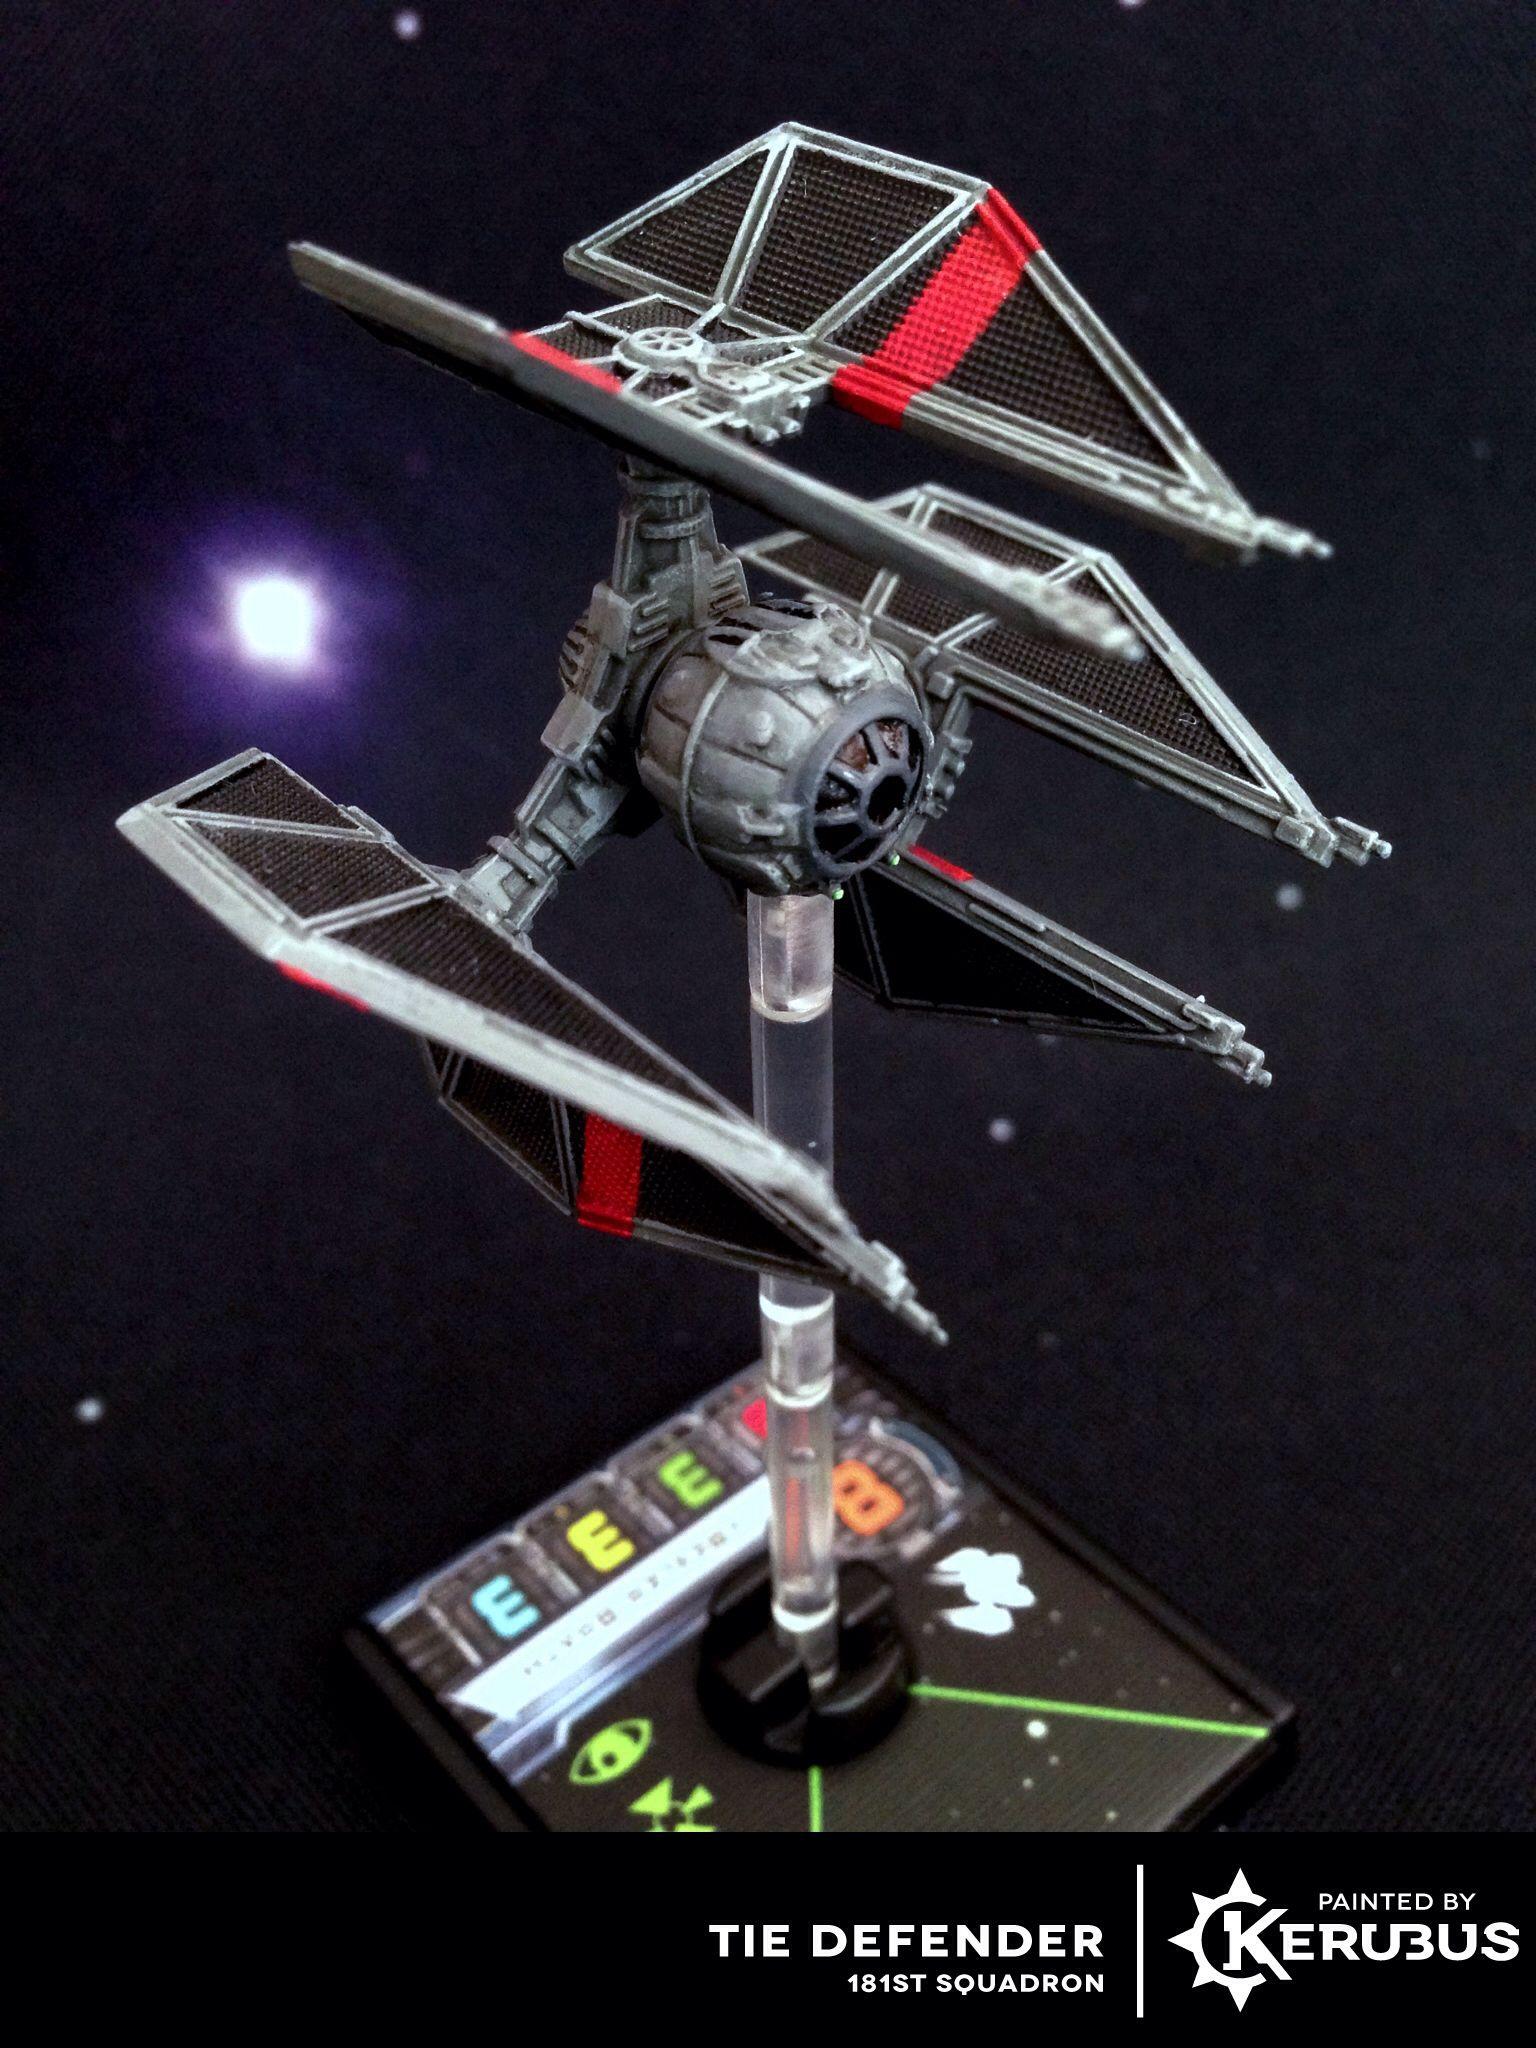 Tie Defender 181st Squadron Star Wars Games Star Wars Ships Design X Wing Miniatures